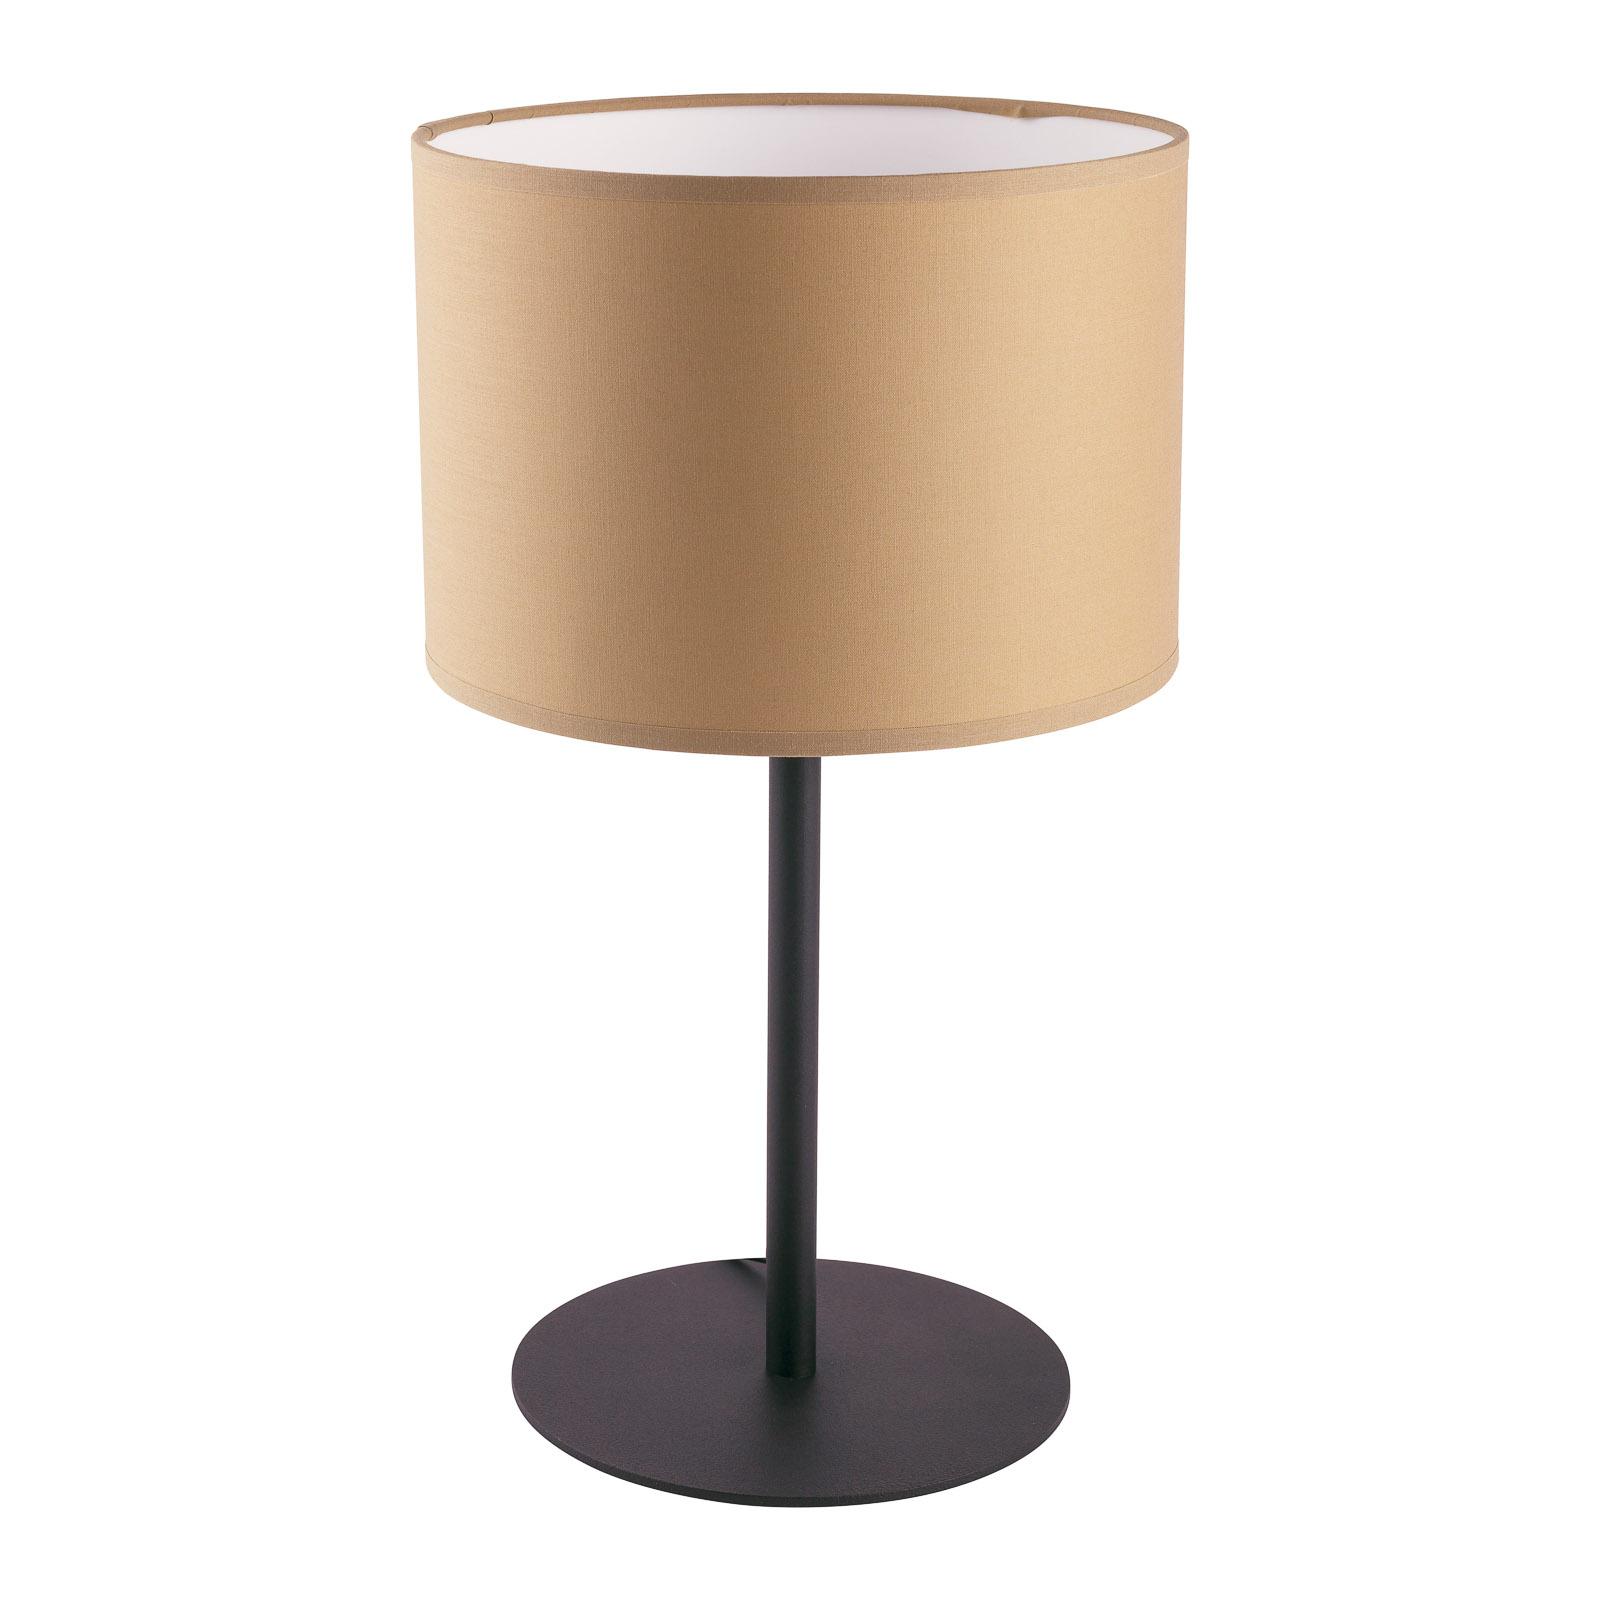 Alice bordlampe med tekstilskærm, kaffebrun